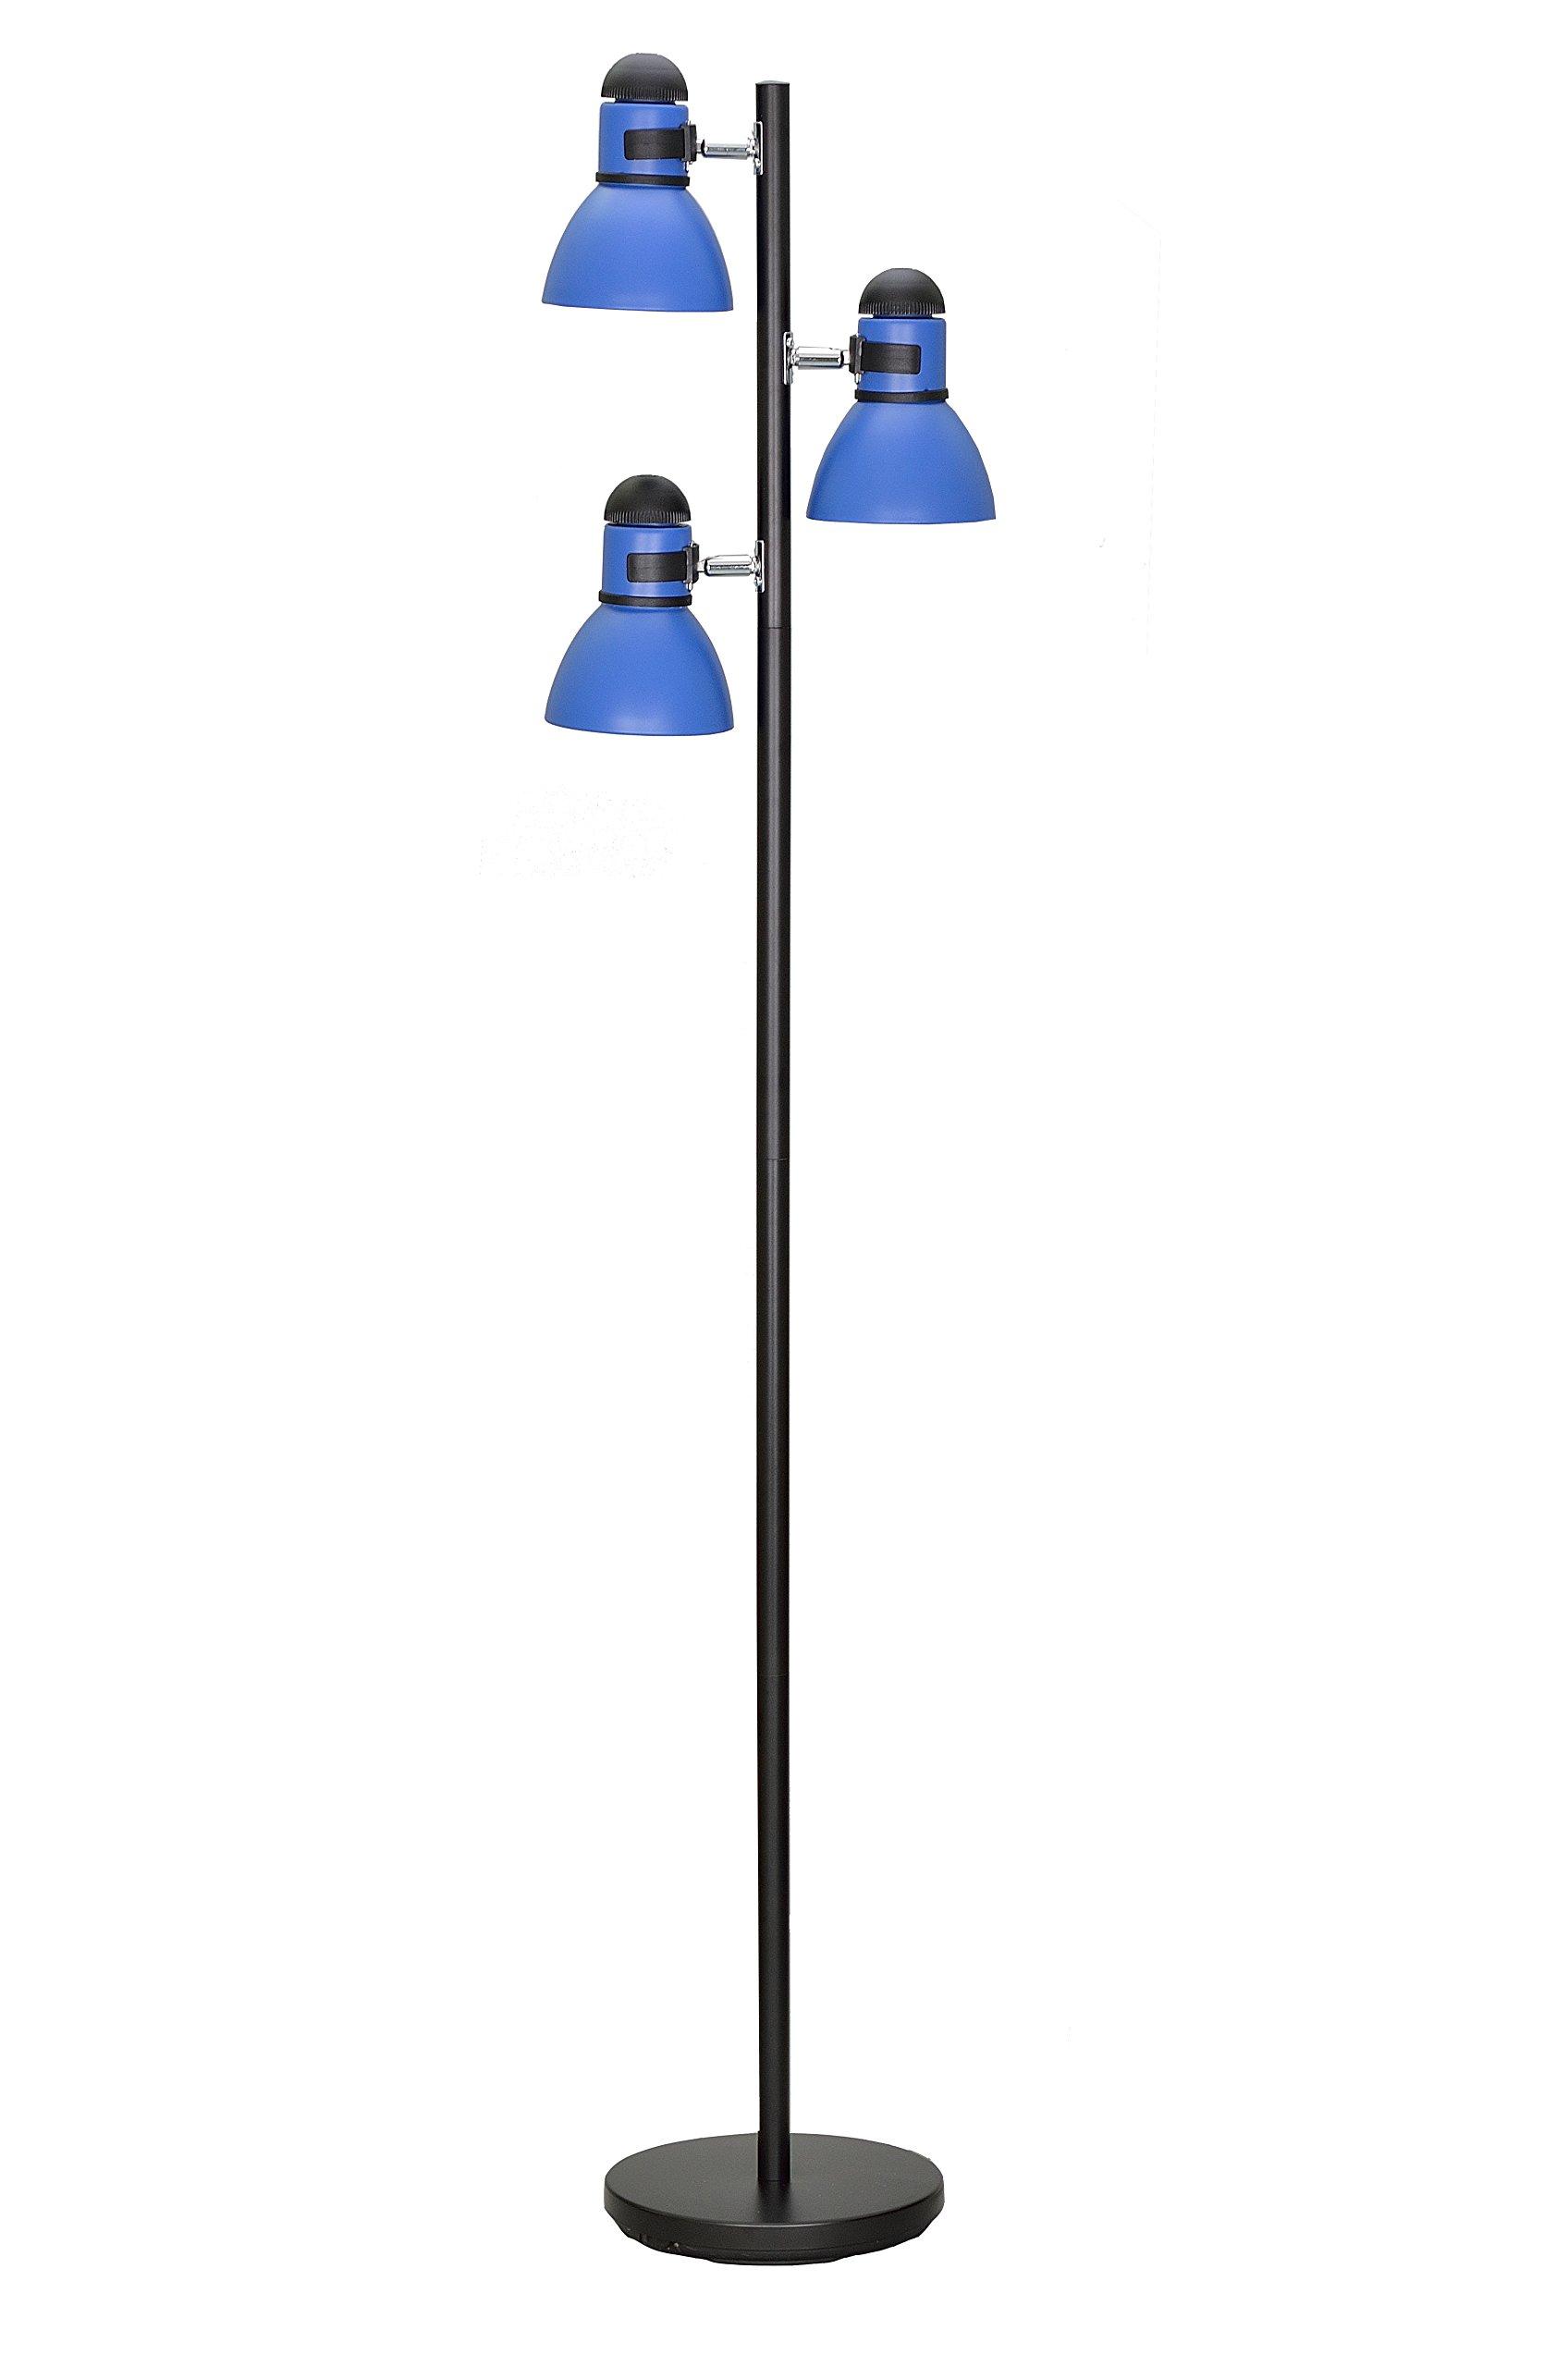 Aspen Creative 45002-3, 3-Light Adjustable Tree Floor Lamp, Modern Design in Black & Blue, 64'' High